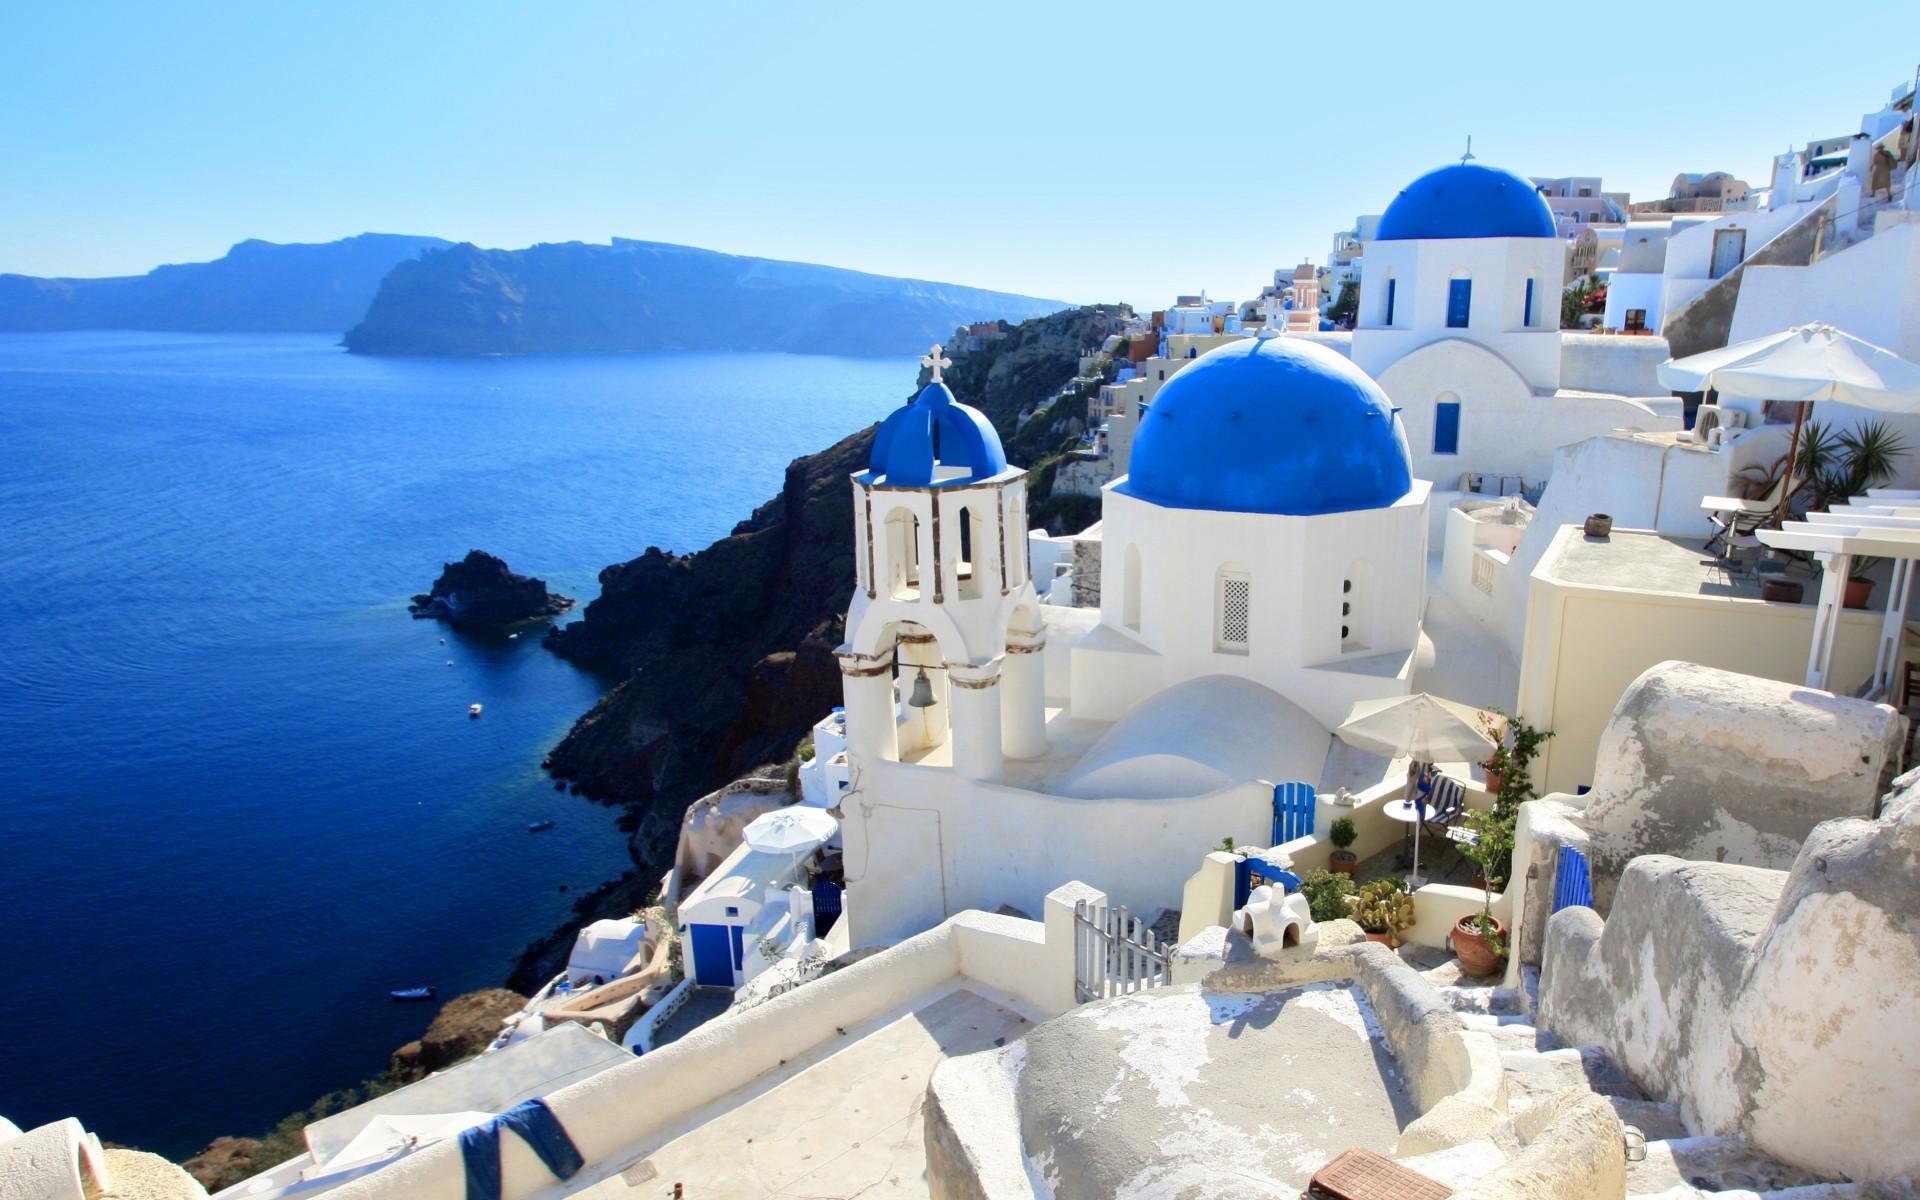 http://www.prasannaholidays.com/wp-content/uploads/2014/05/Santorini-Greece.jpg